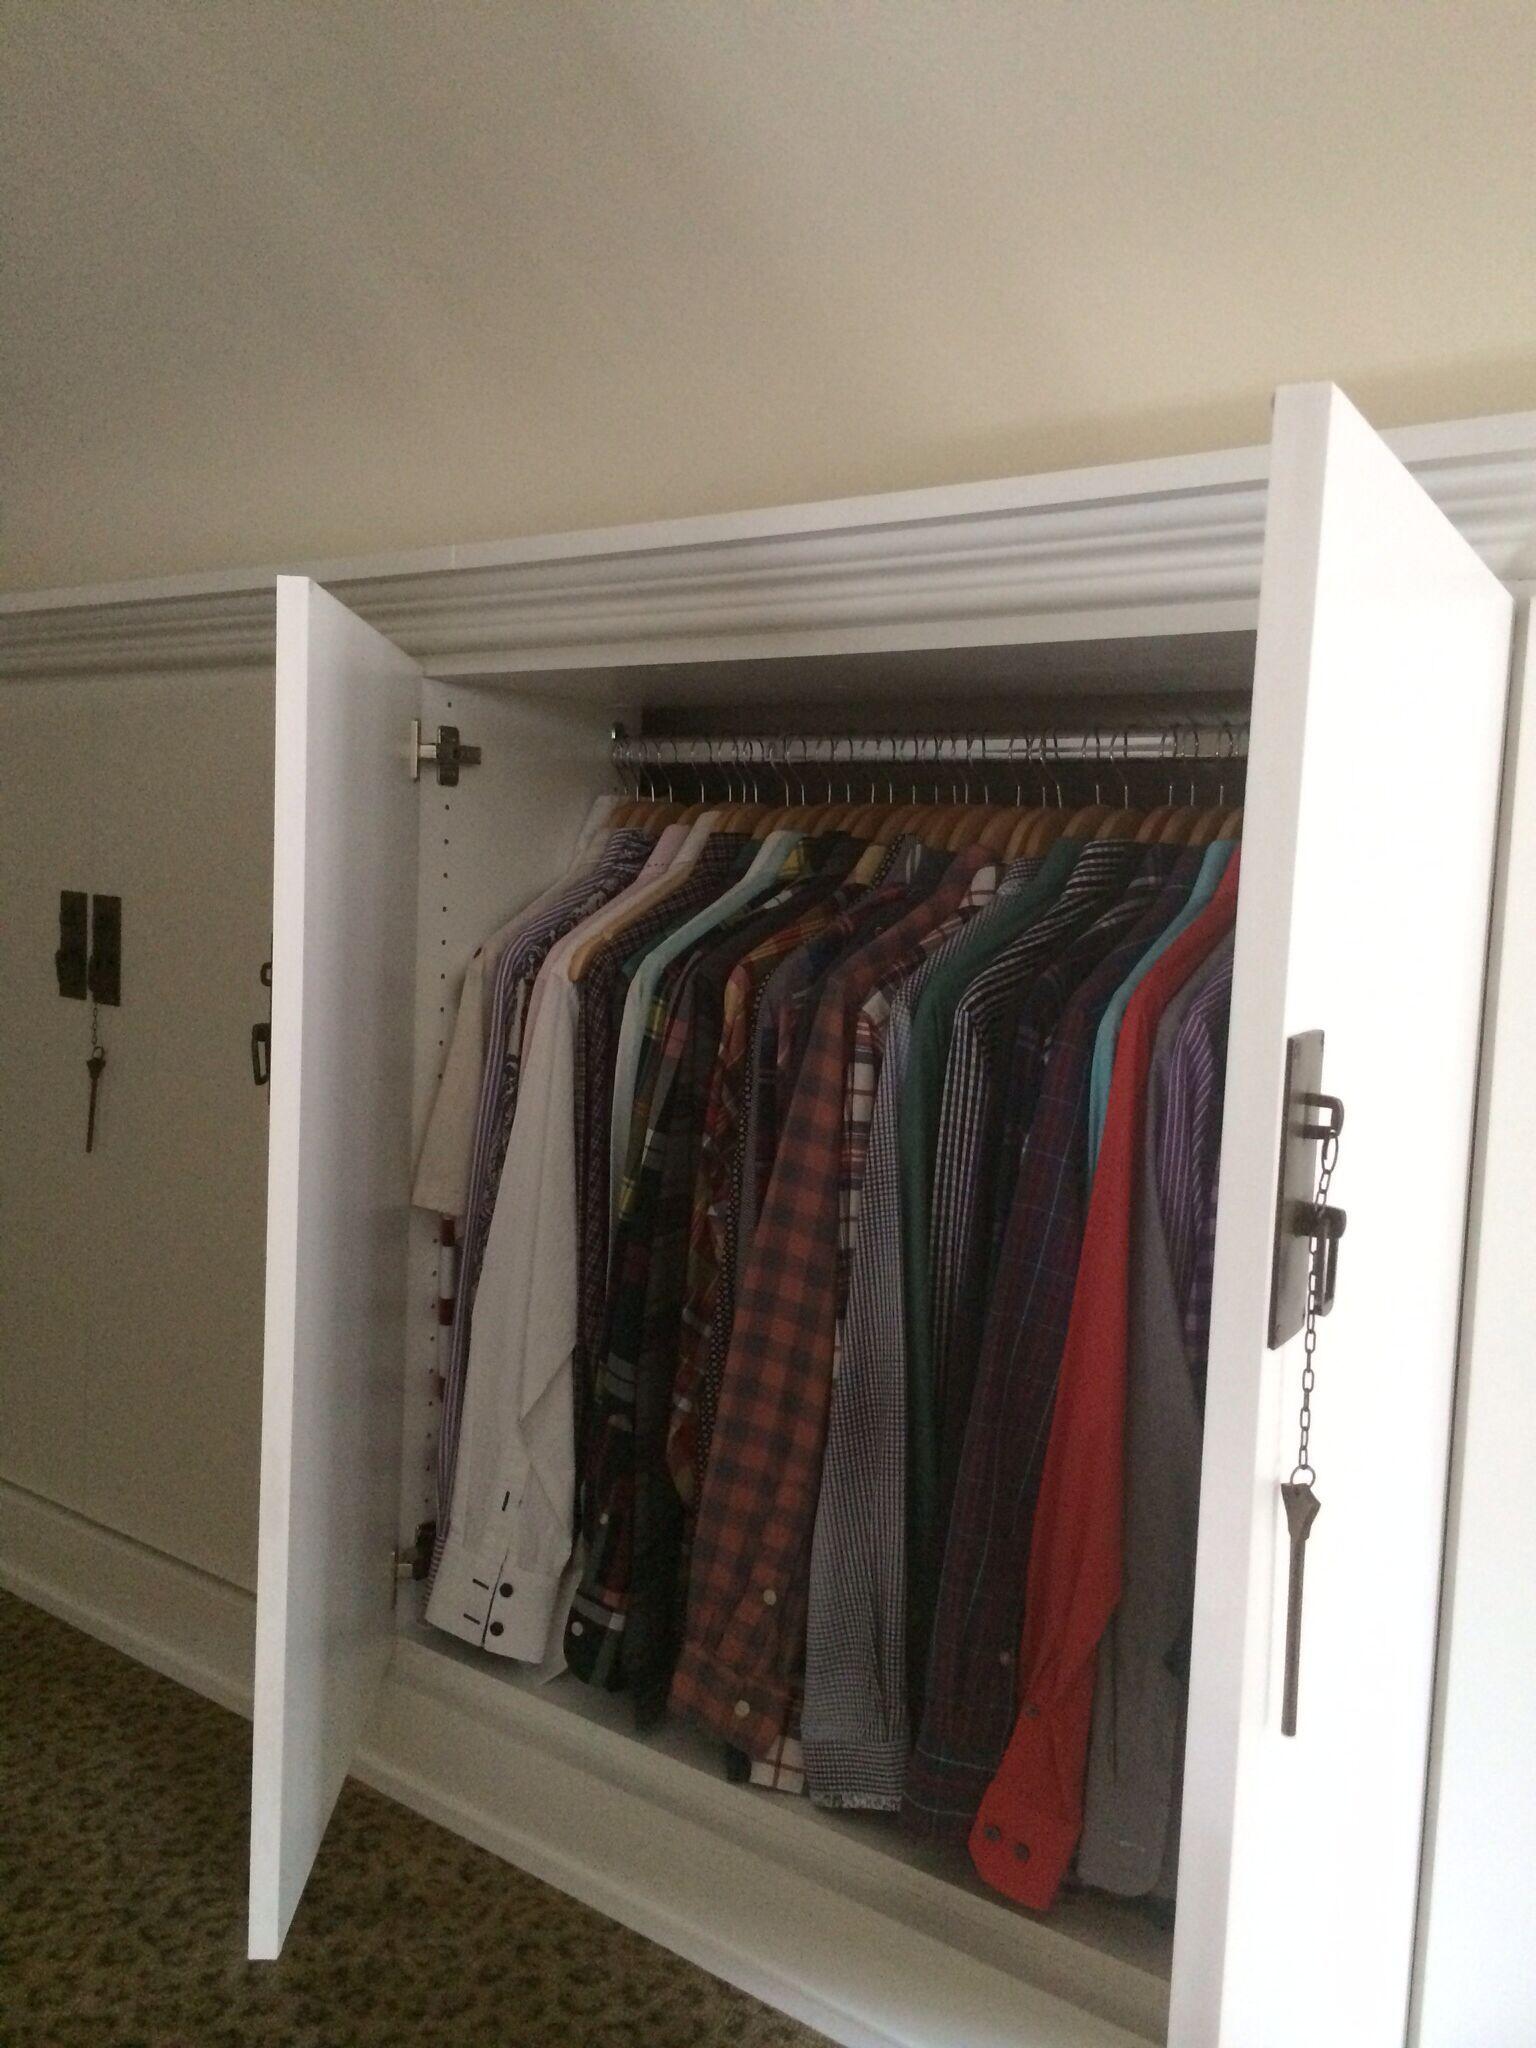 Attic Storage Room Organization